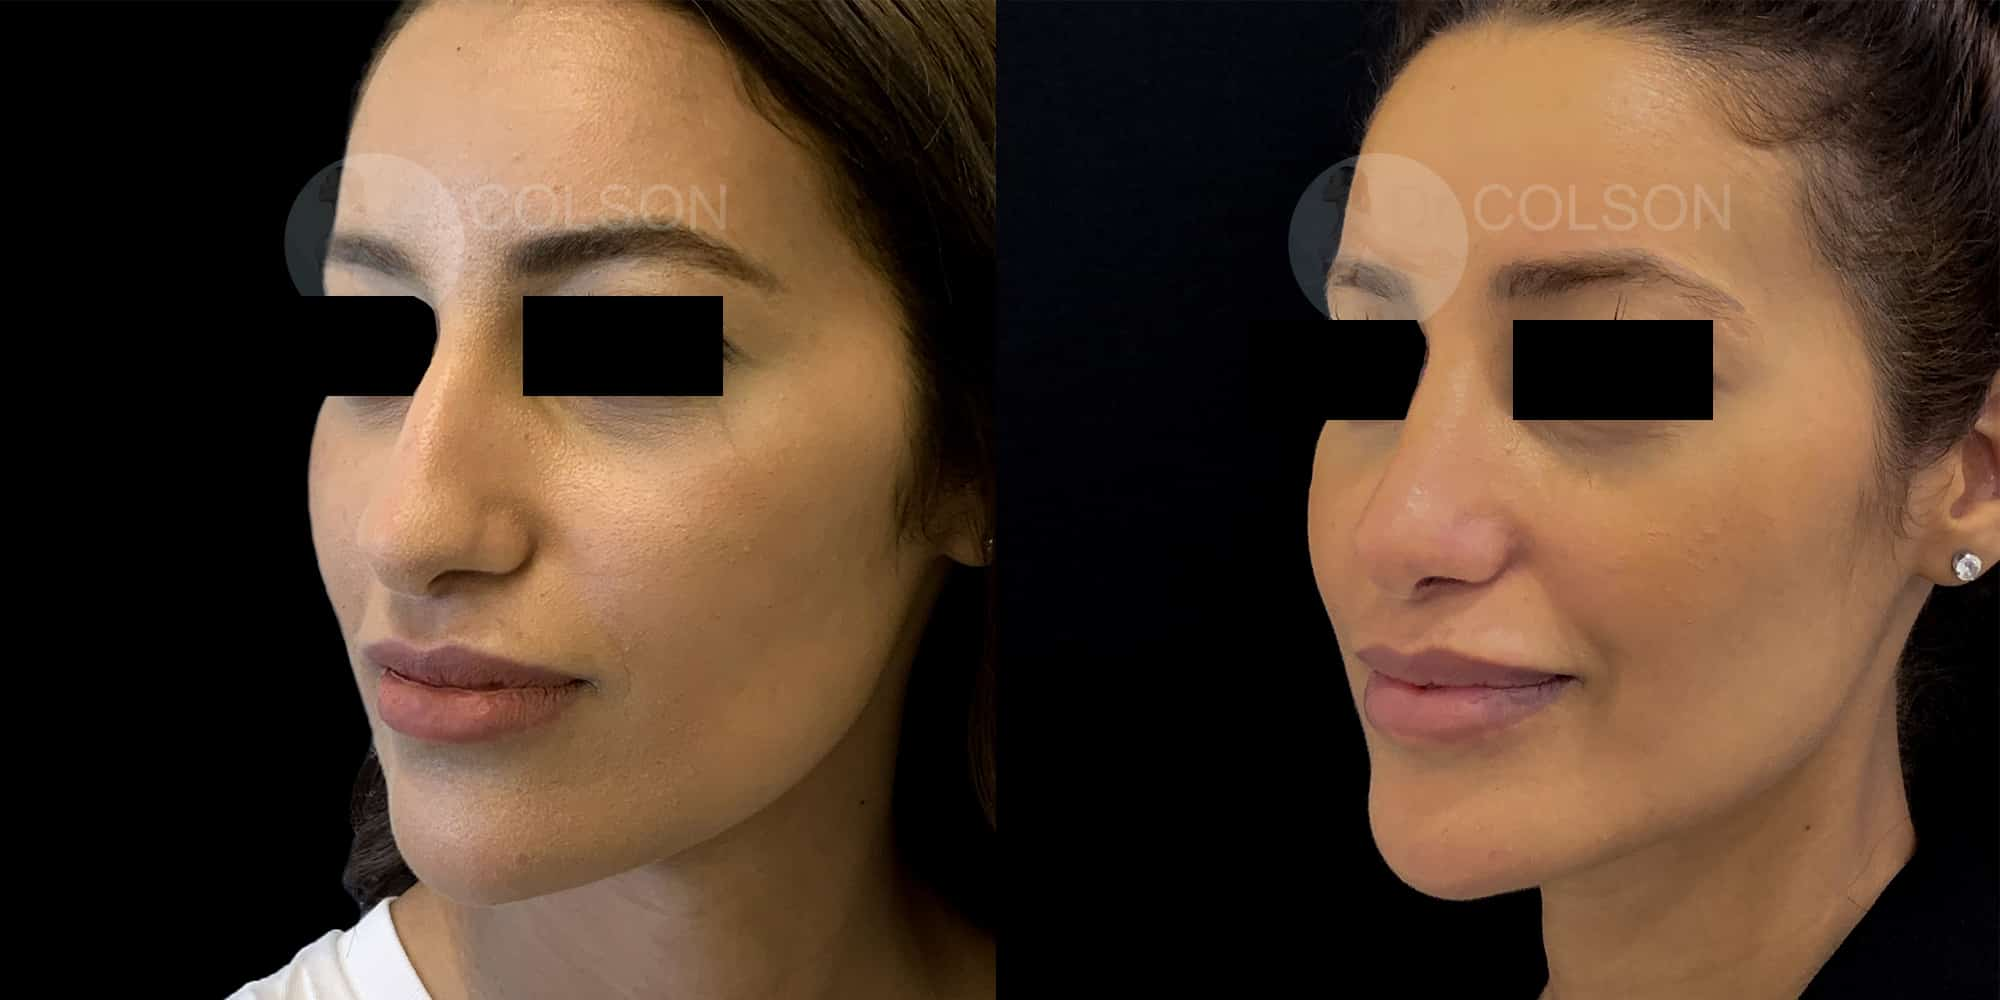 Dr Colson - Chirurgie visage - Rhinoplastie Trois Quart